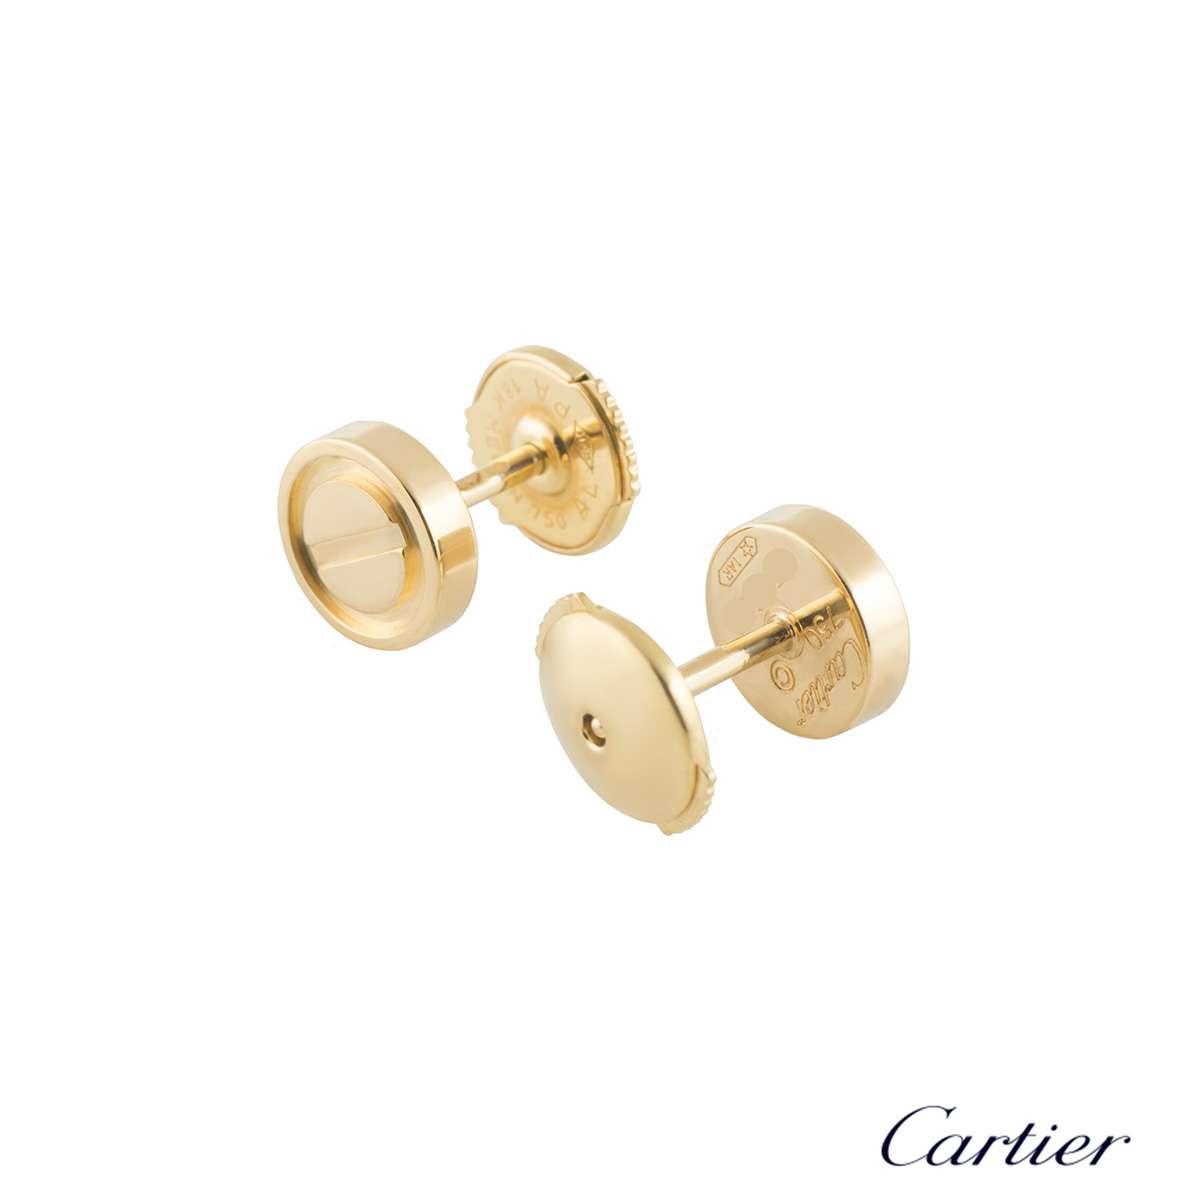 Cartier Love Earring Studs